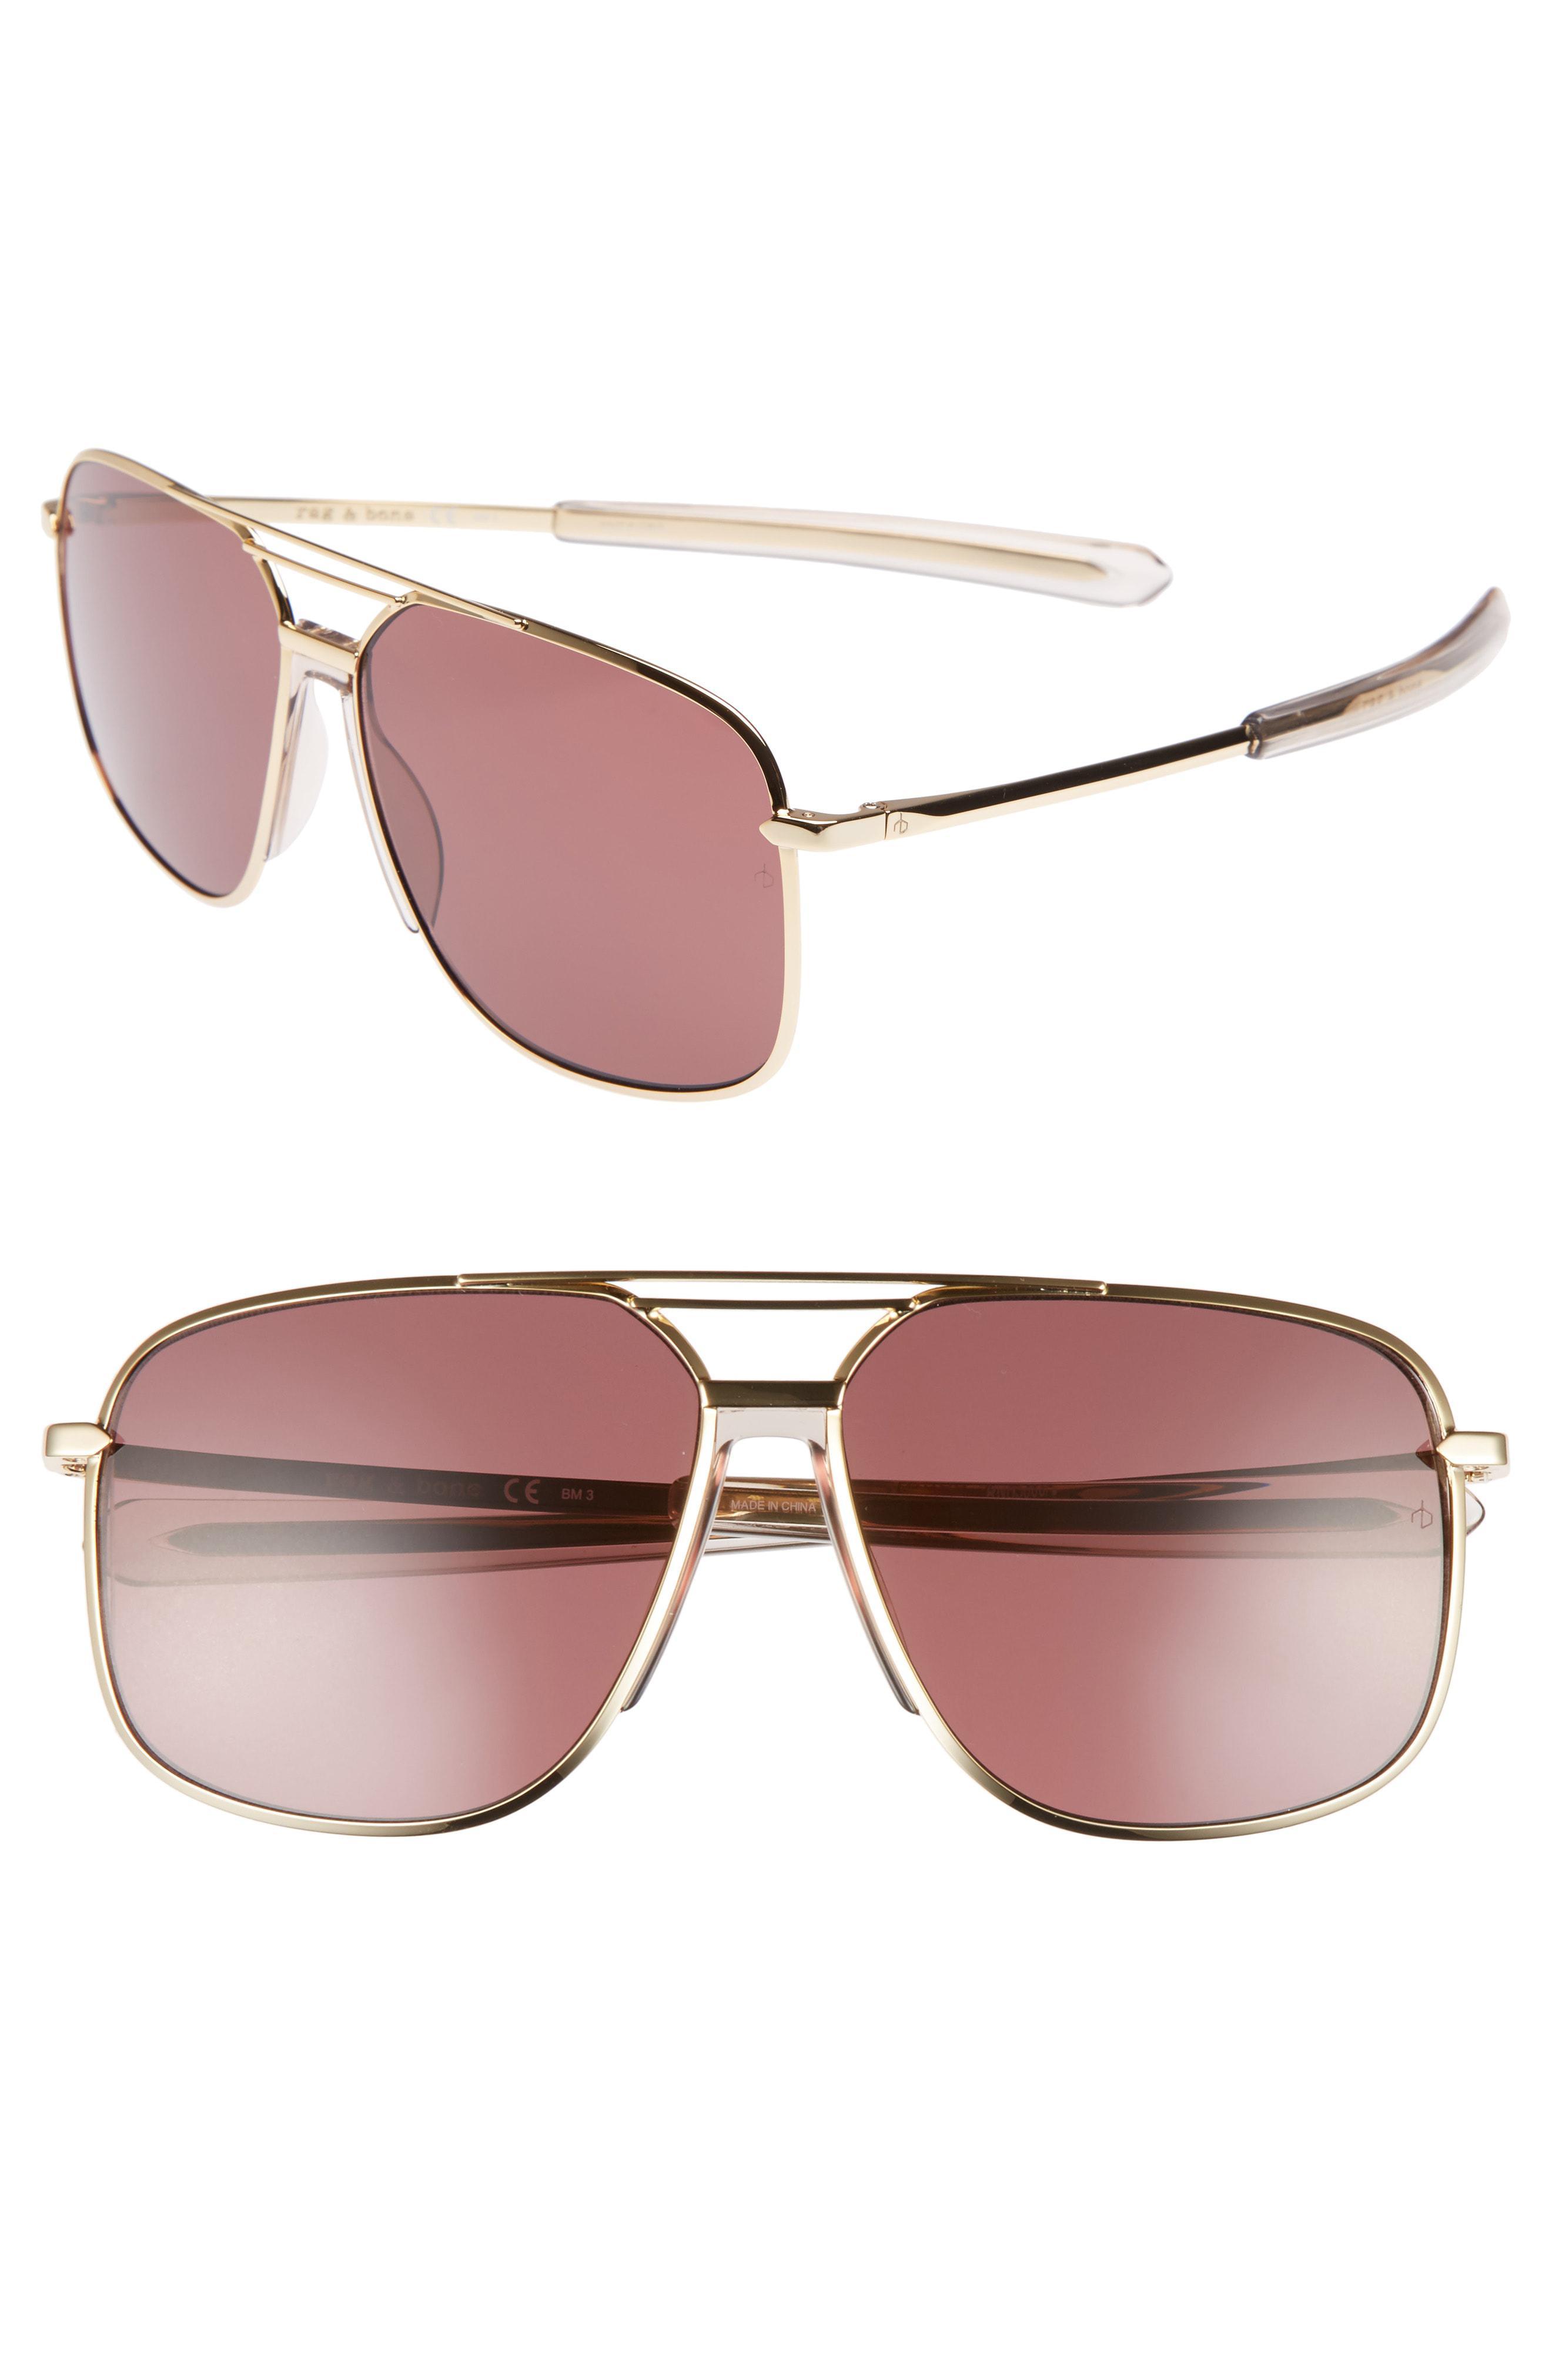 1196730e8096 Lyst - Rag   Bone Caravan 62mm Oversize Aviator Sunglasses - in Brown